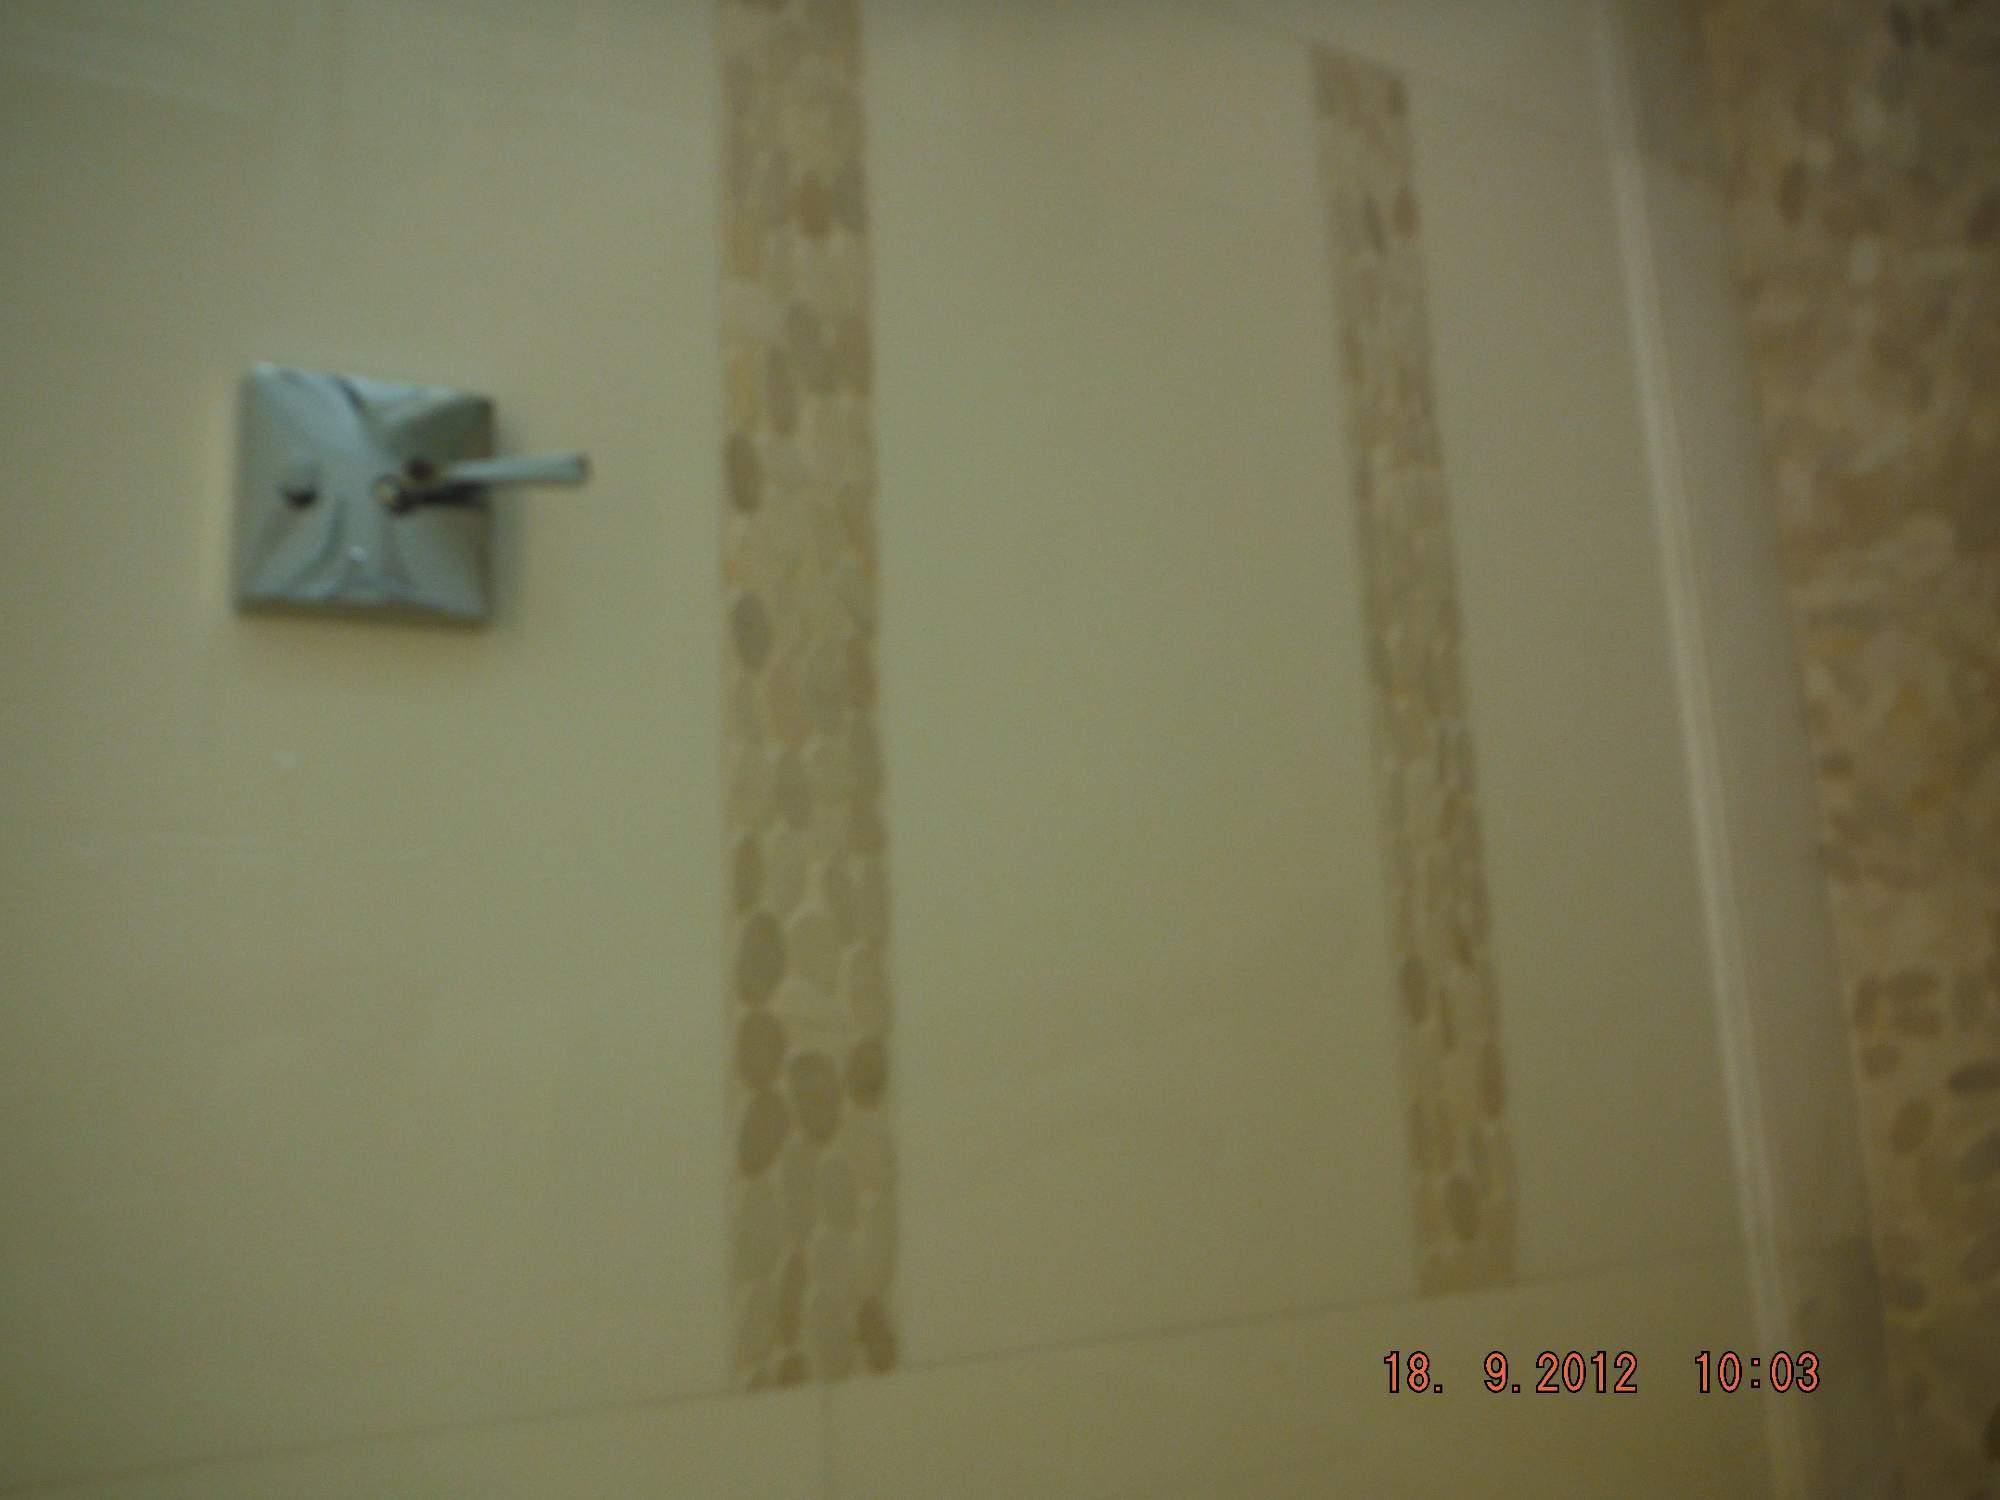 http://img24.rajce.idnes.cz/d2403/13/13214/13214242_a1e43f49e51a1daa7632f800d4edae3f/images/SAE542.jpg